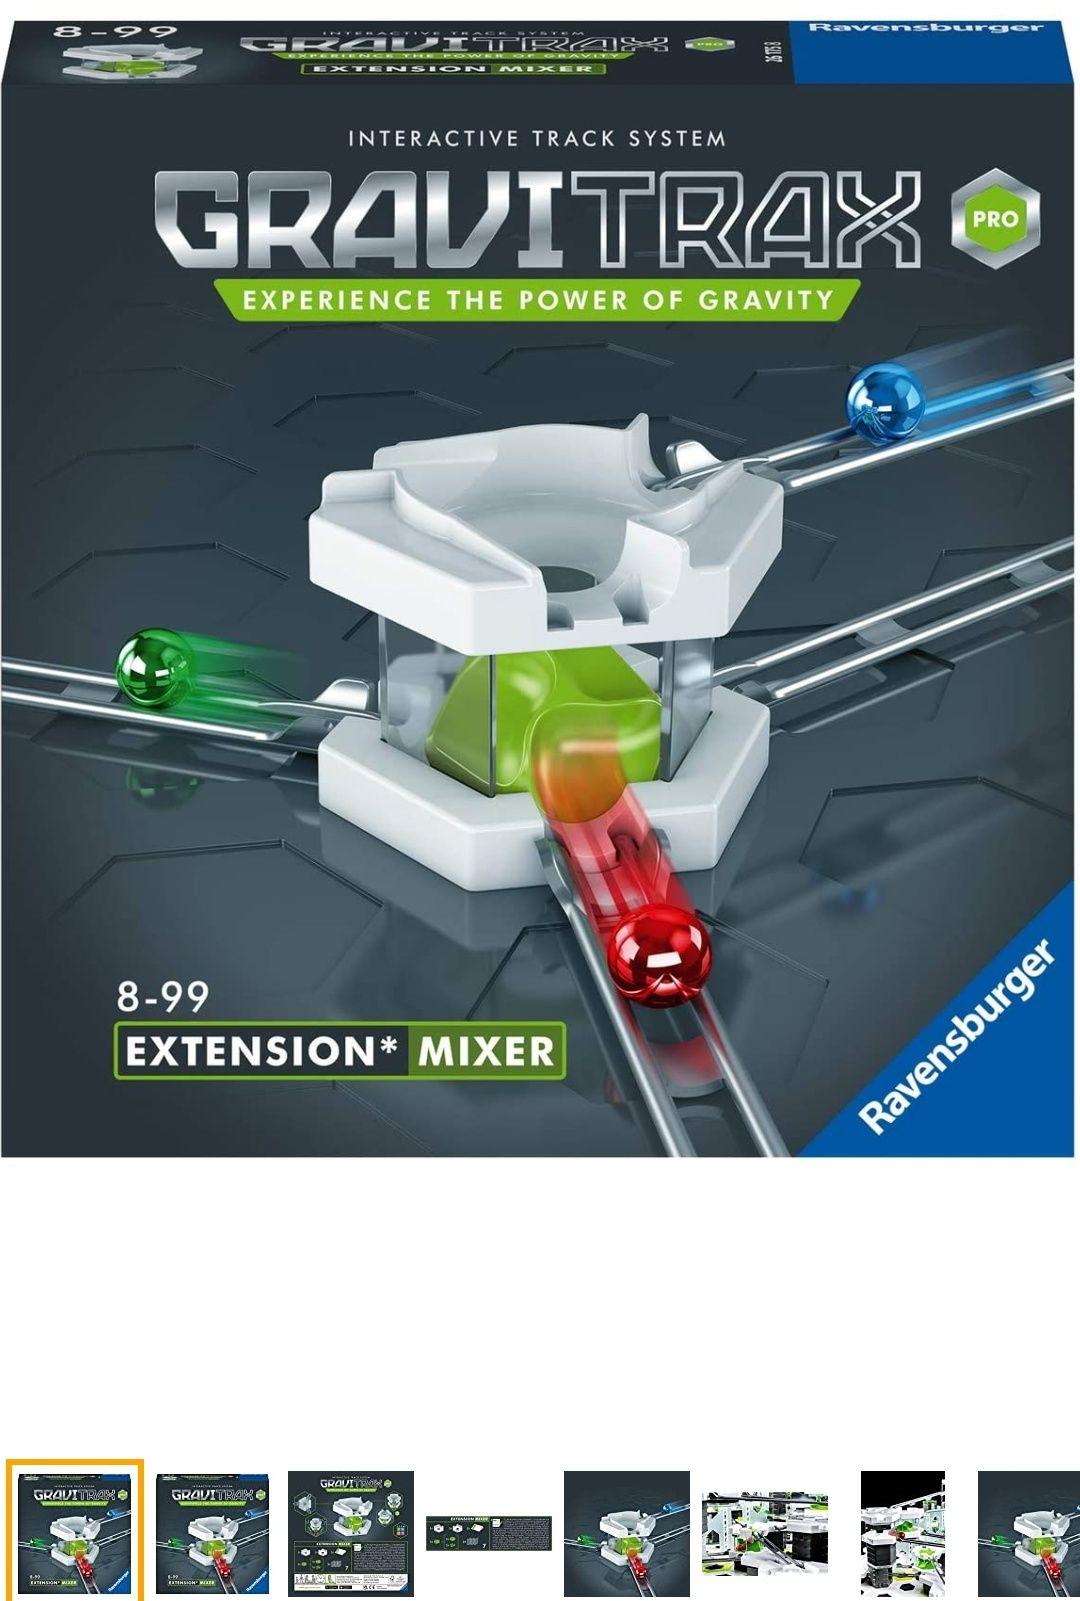 GraviTrax Pro Vertical Mixer